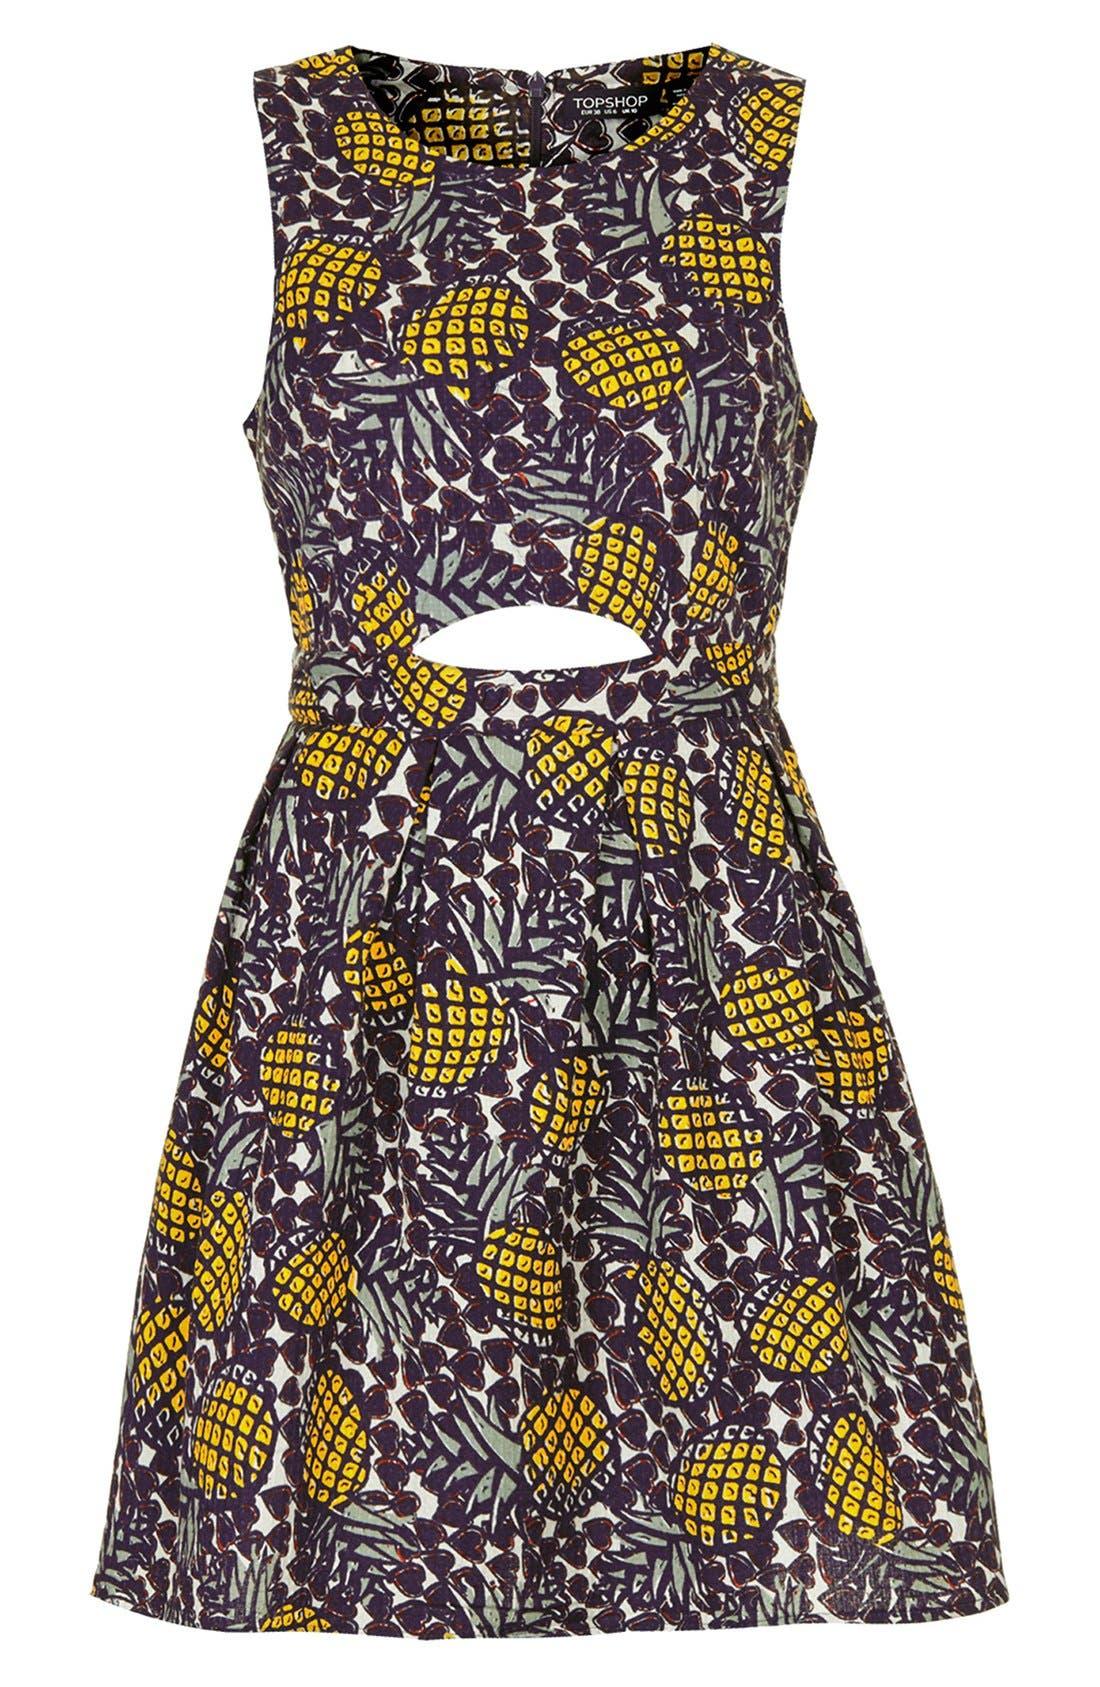 Pineapple Print Cutout Fit & Flare Dress,                             Alternate thumbnail 3, color,                             700